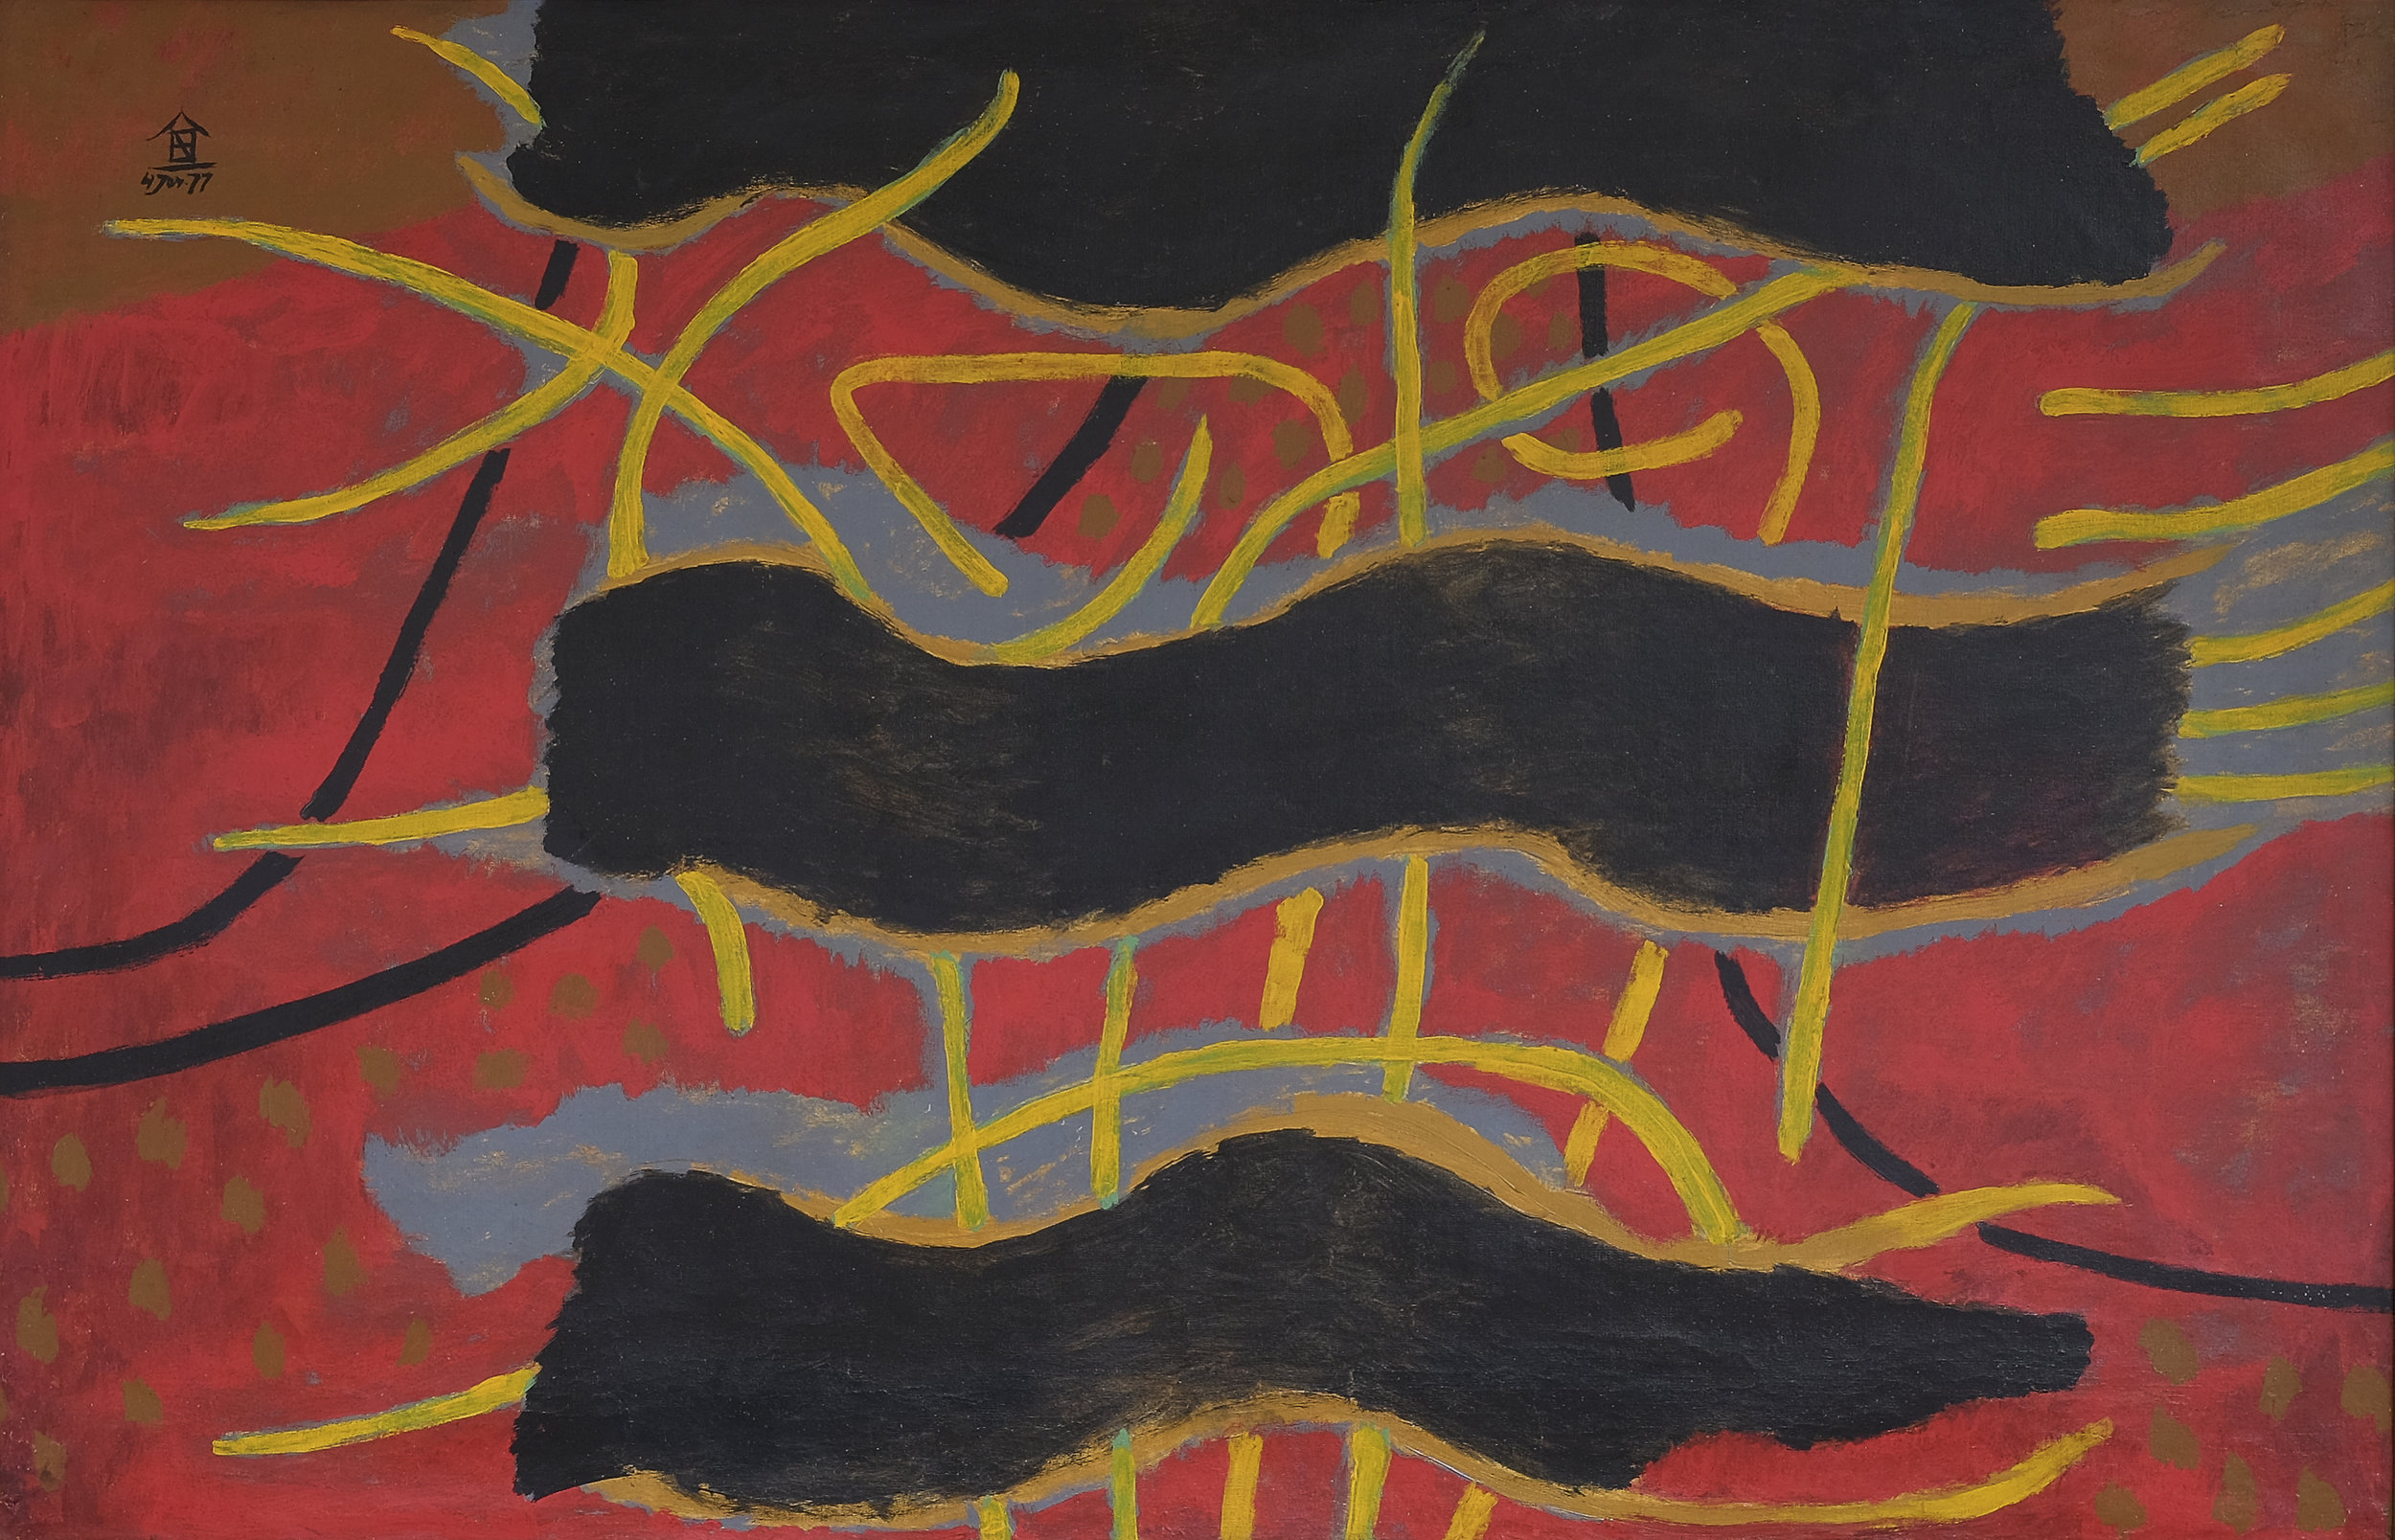 Nashar, Larut Malam (Late Night), oil on canvas, 90 x 138 cm, 1977